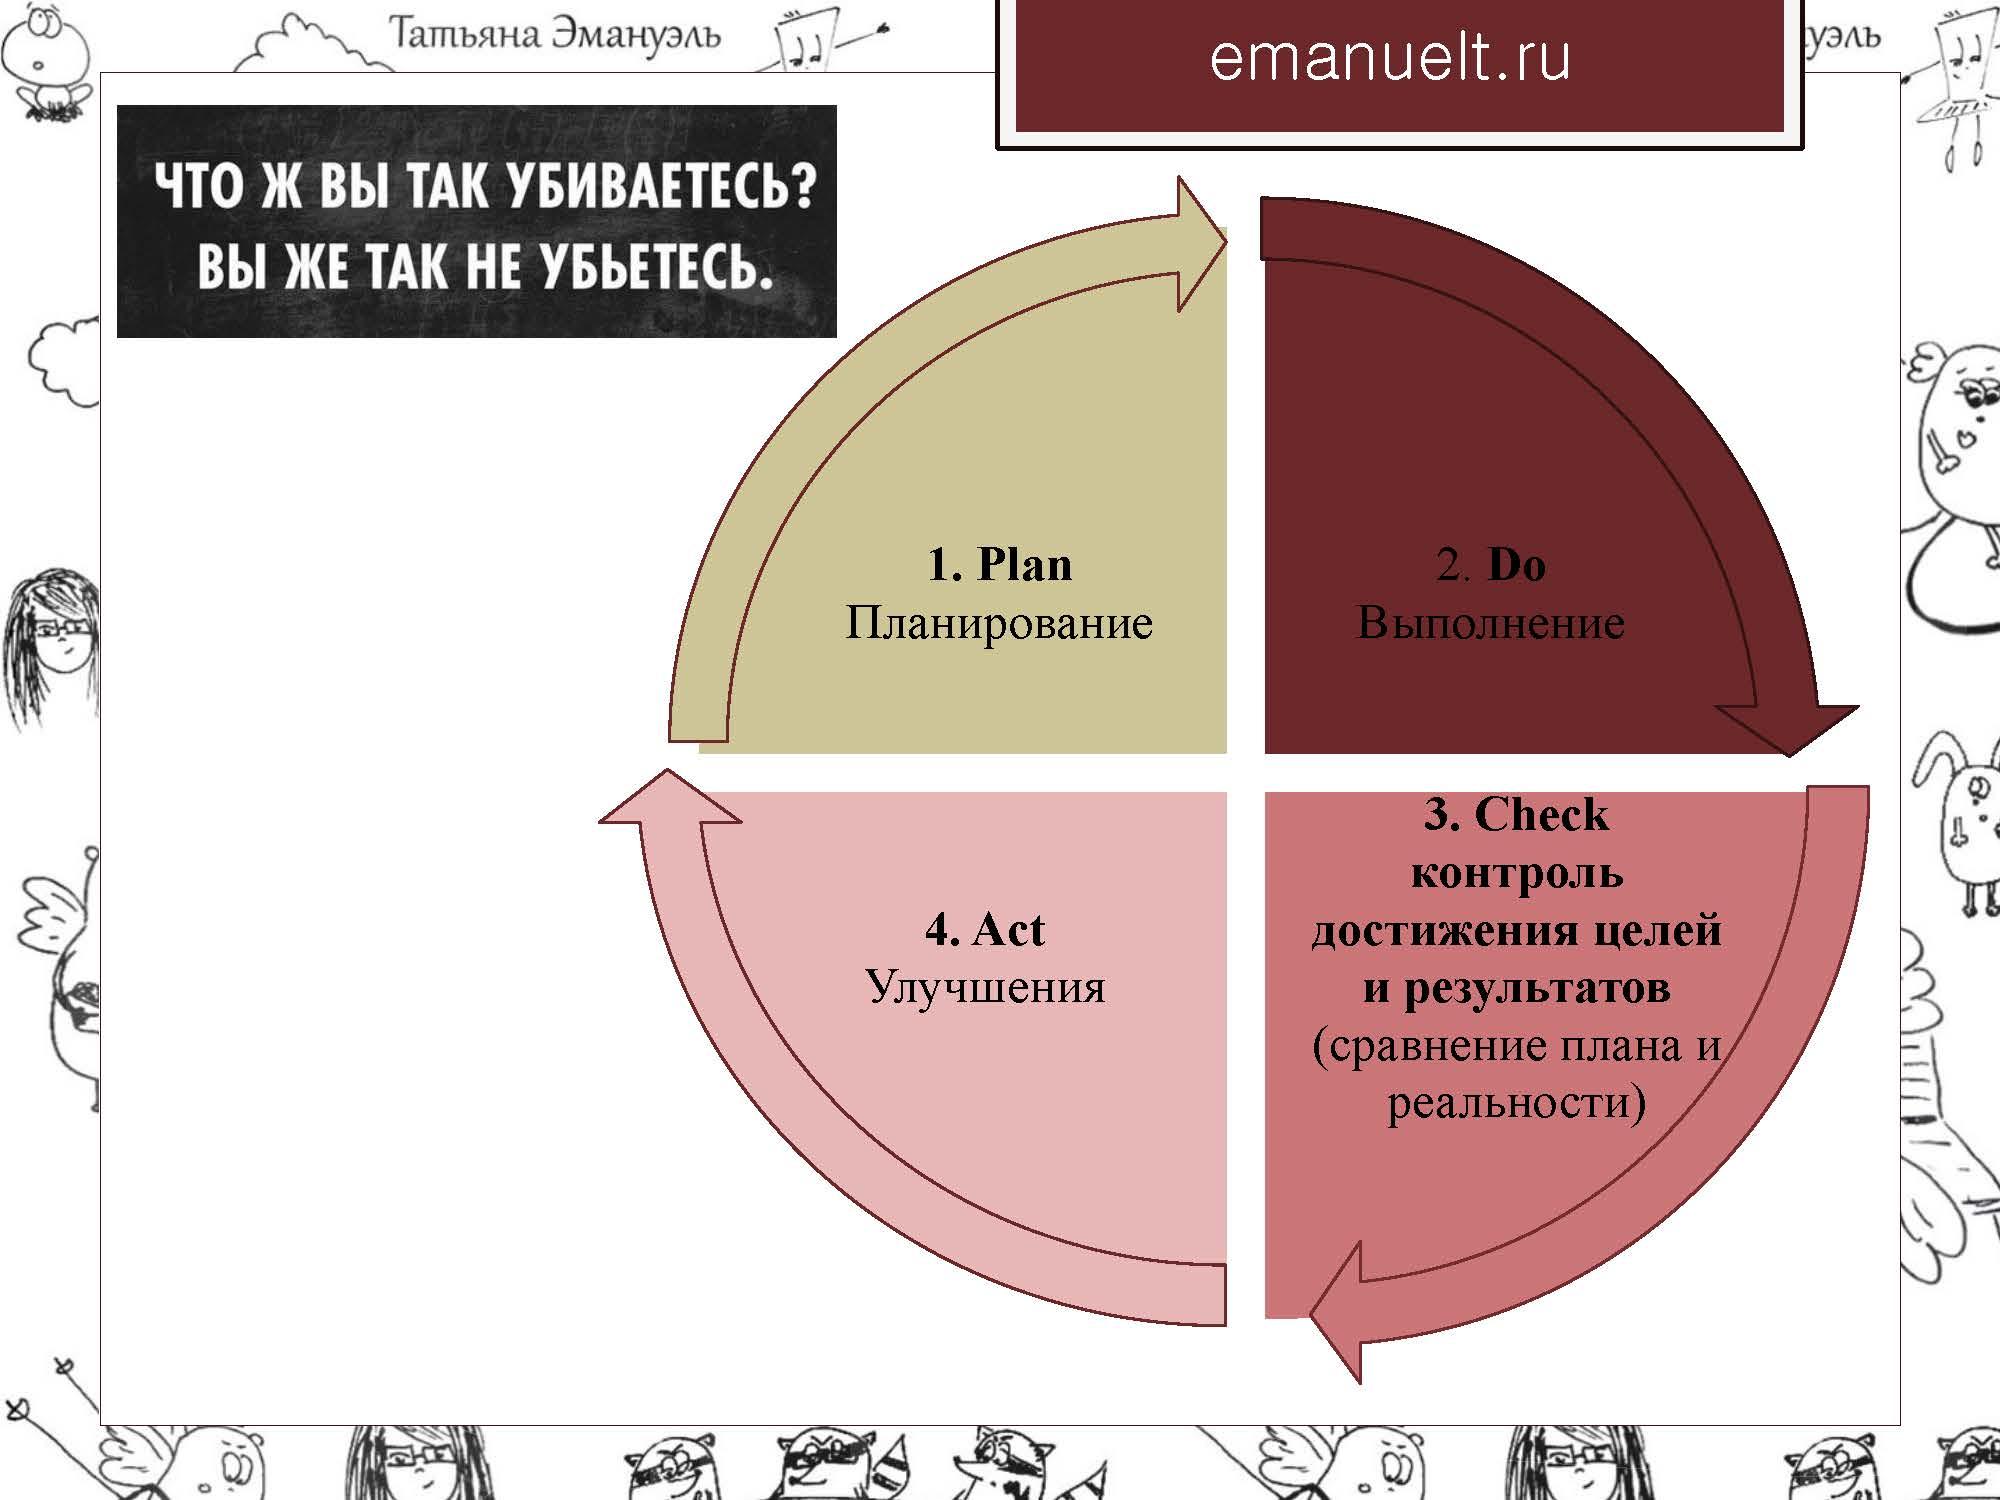 06 февраля эмануэль_Страница_006